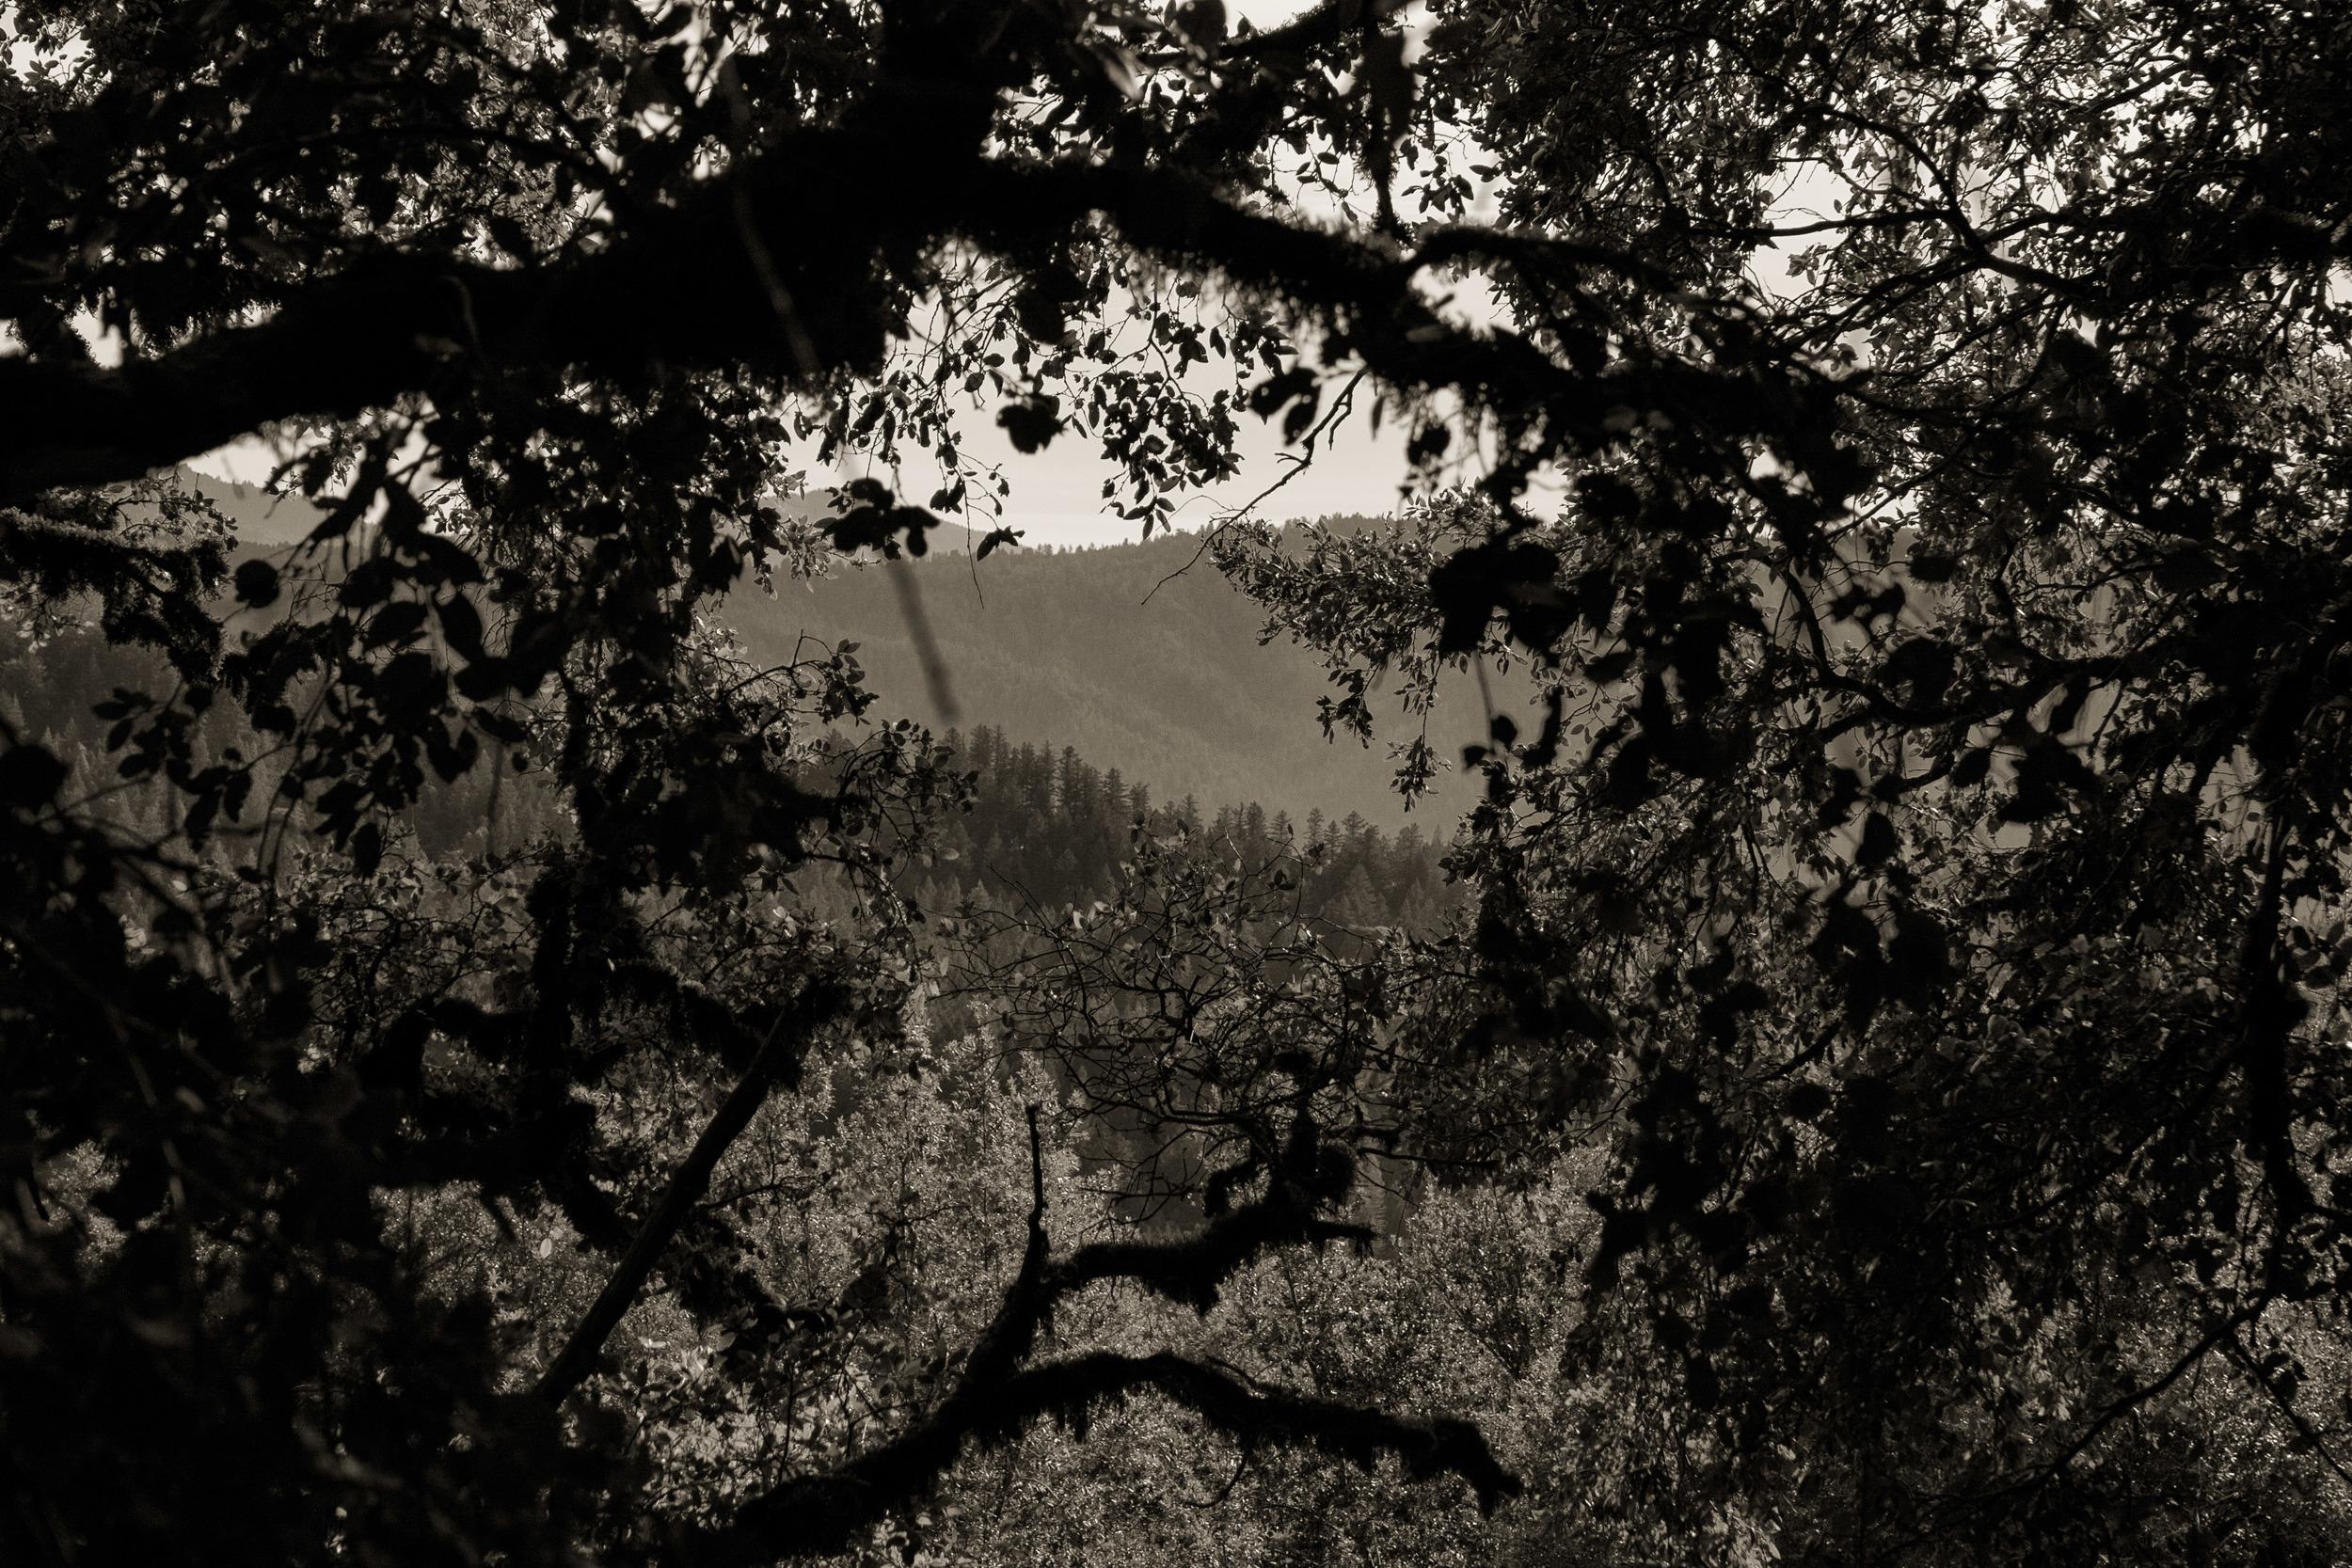 IMG_1925-Edit.jpg